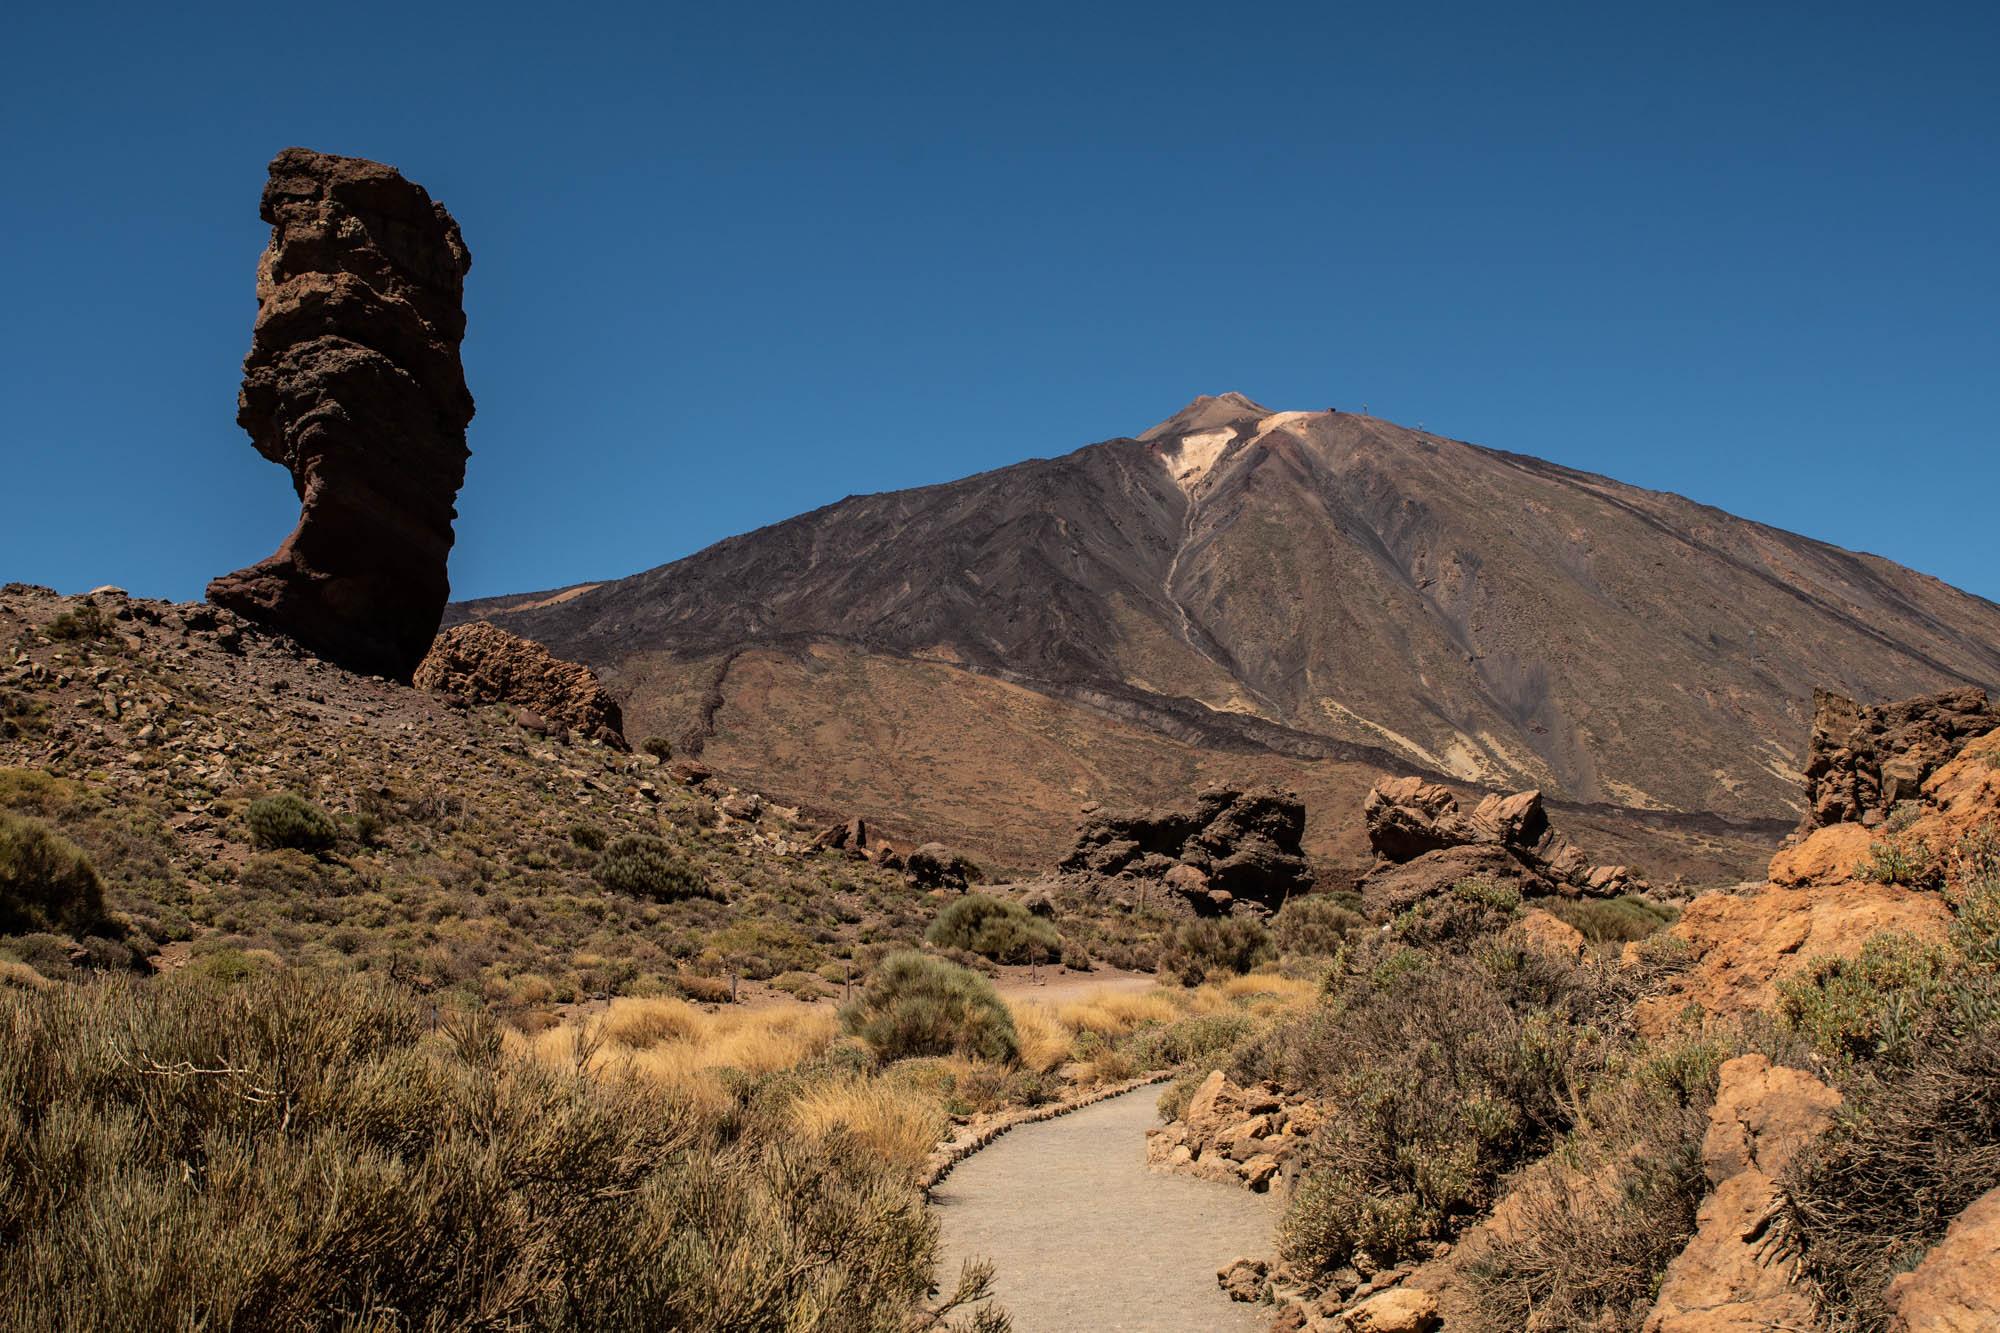 Roques de García (El Teide)